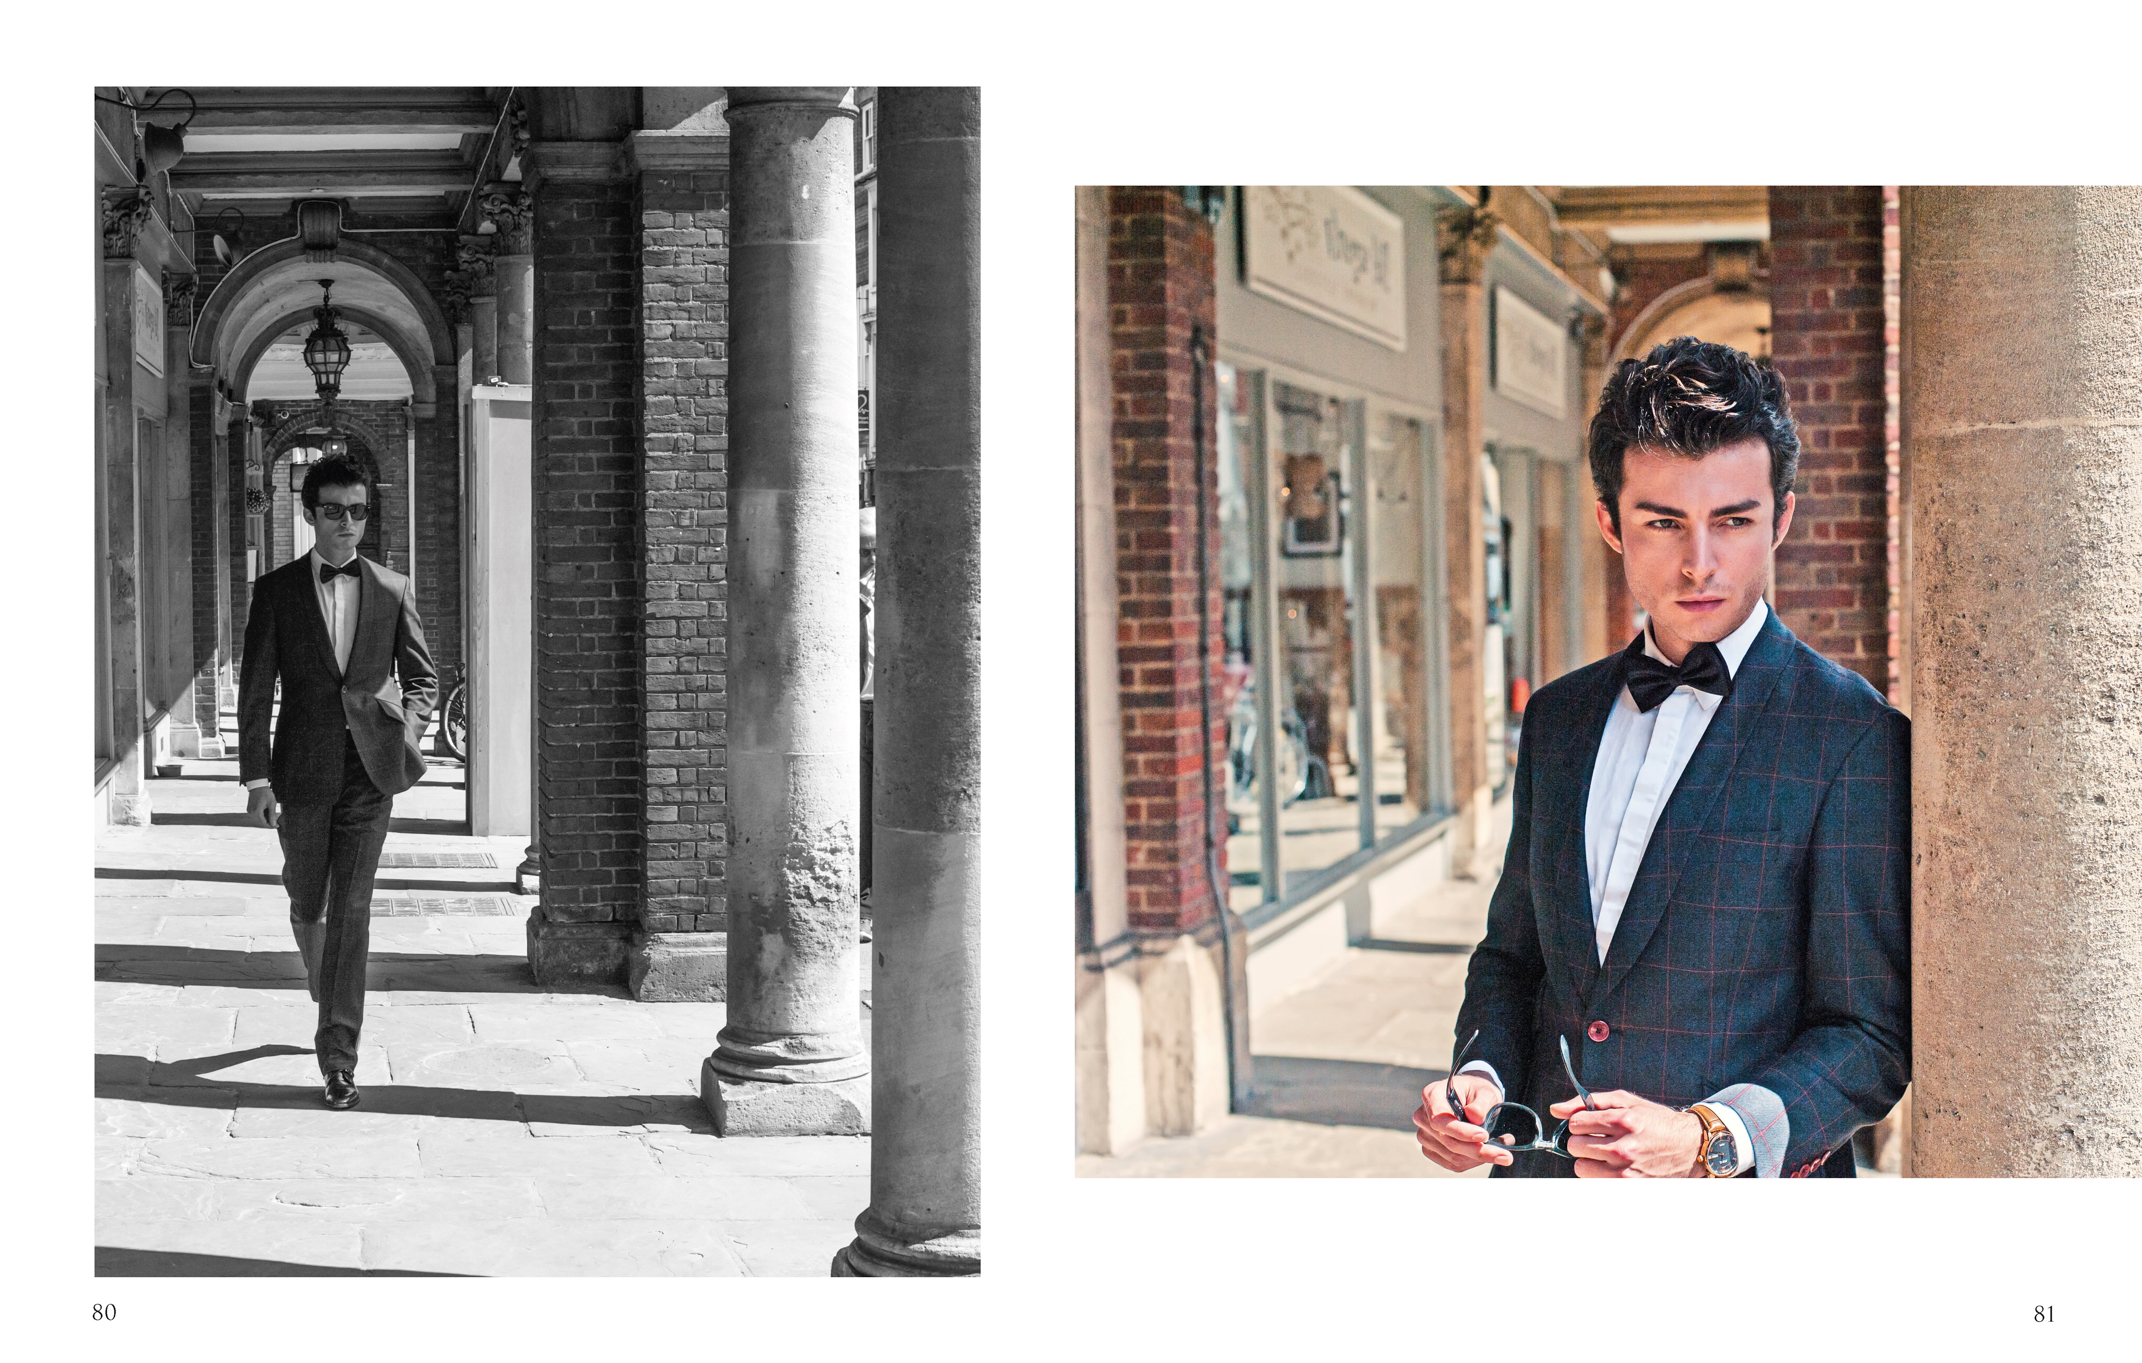 Fashion editorial portrait by Farnham, Surrey based photographer James Muller